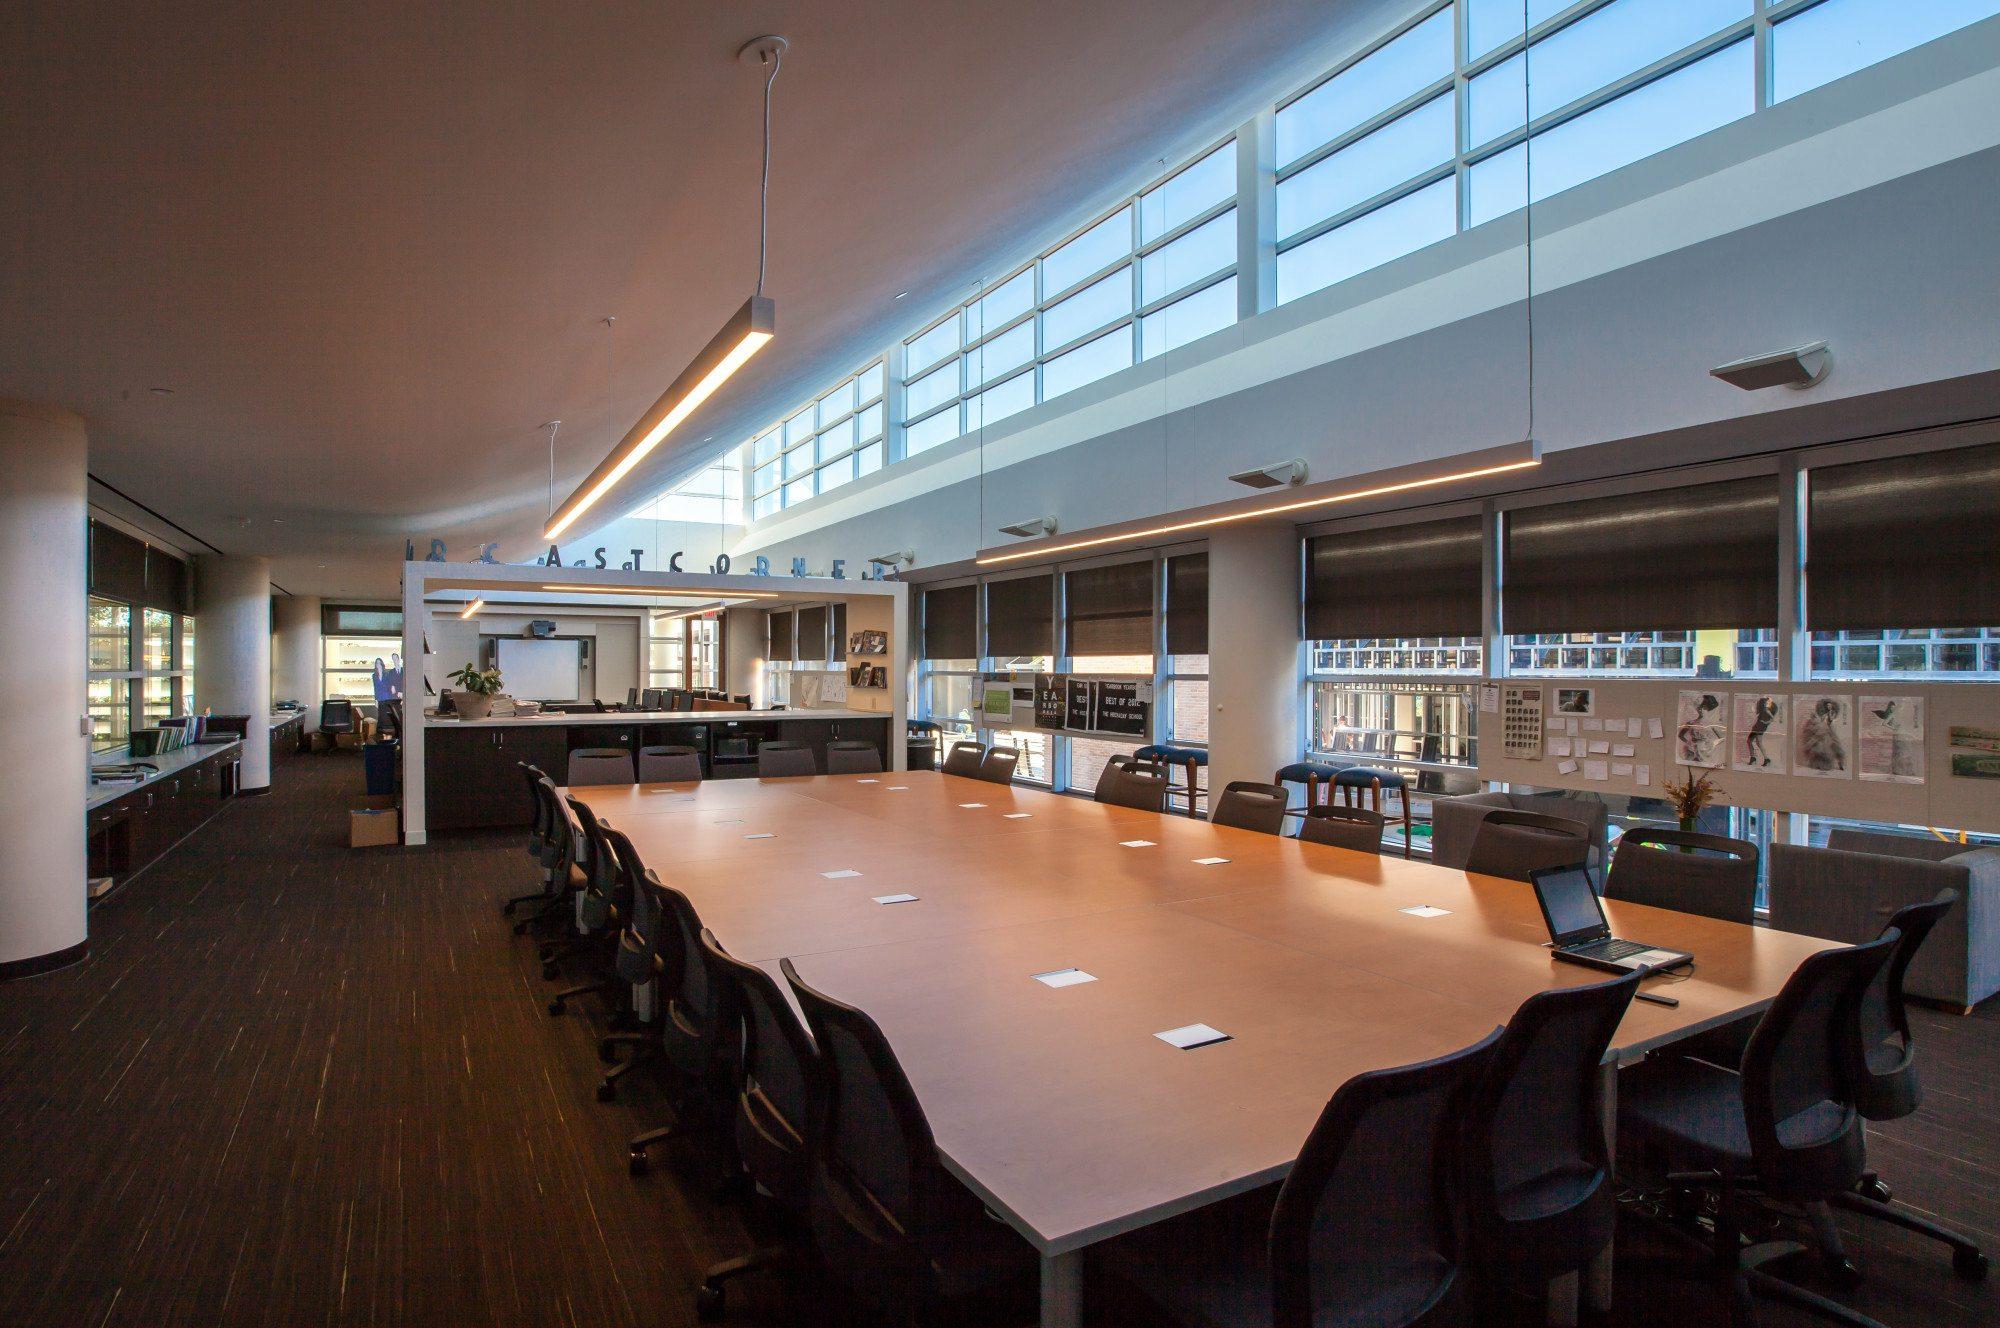 The Hockaday School Liza Lee Academic Research Center